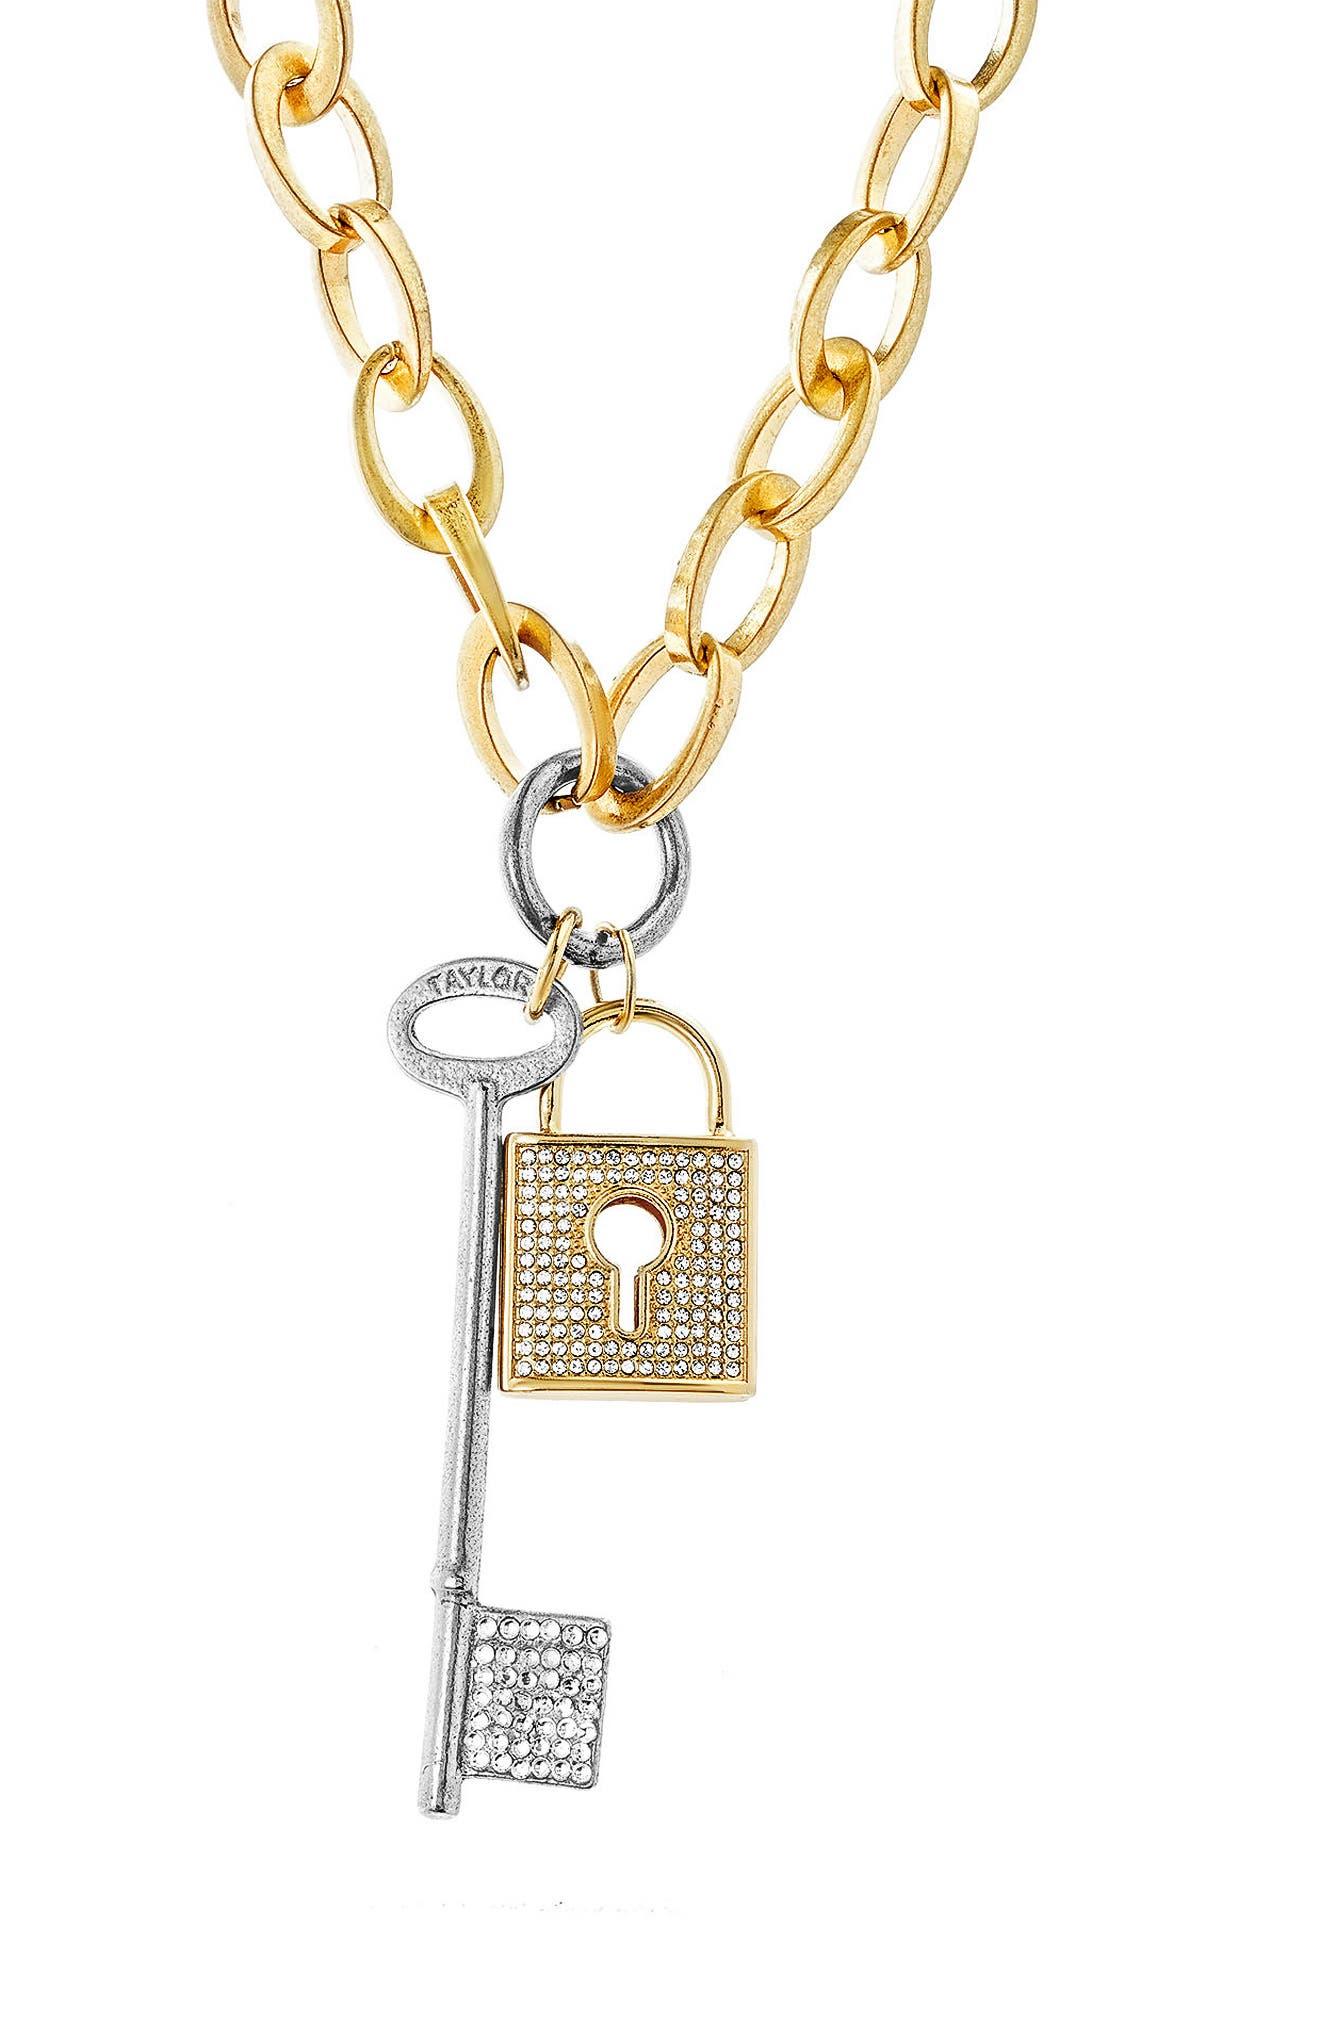 Main Image - Steve Madden Lock & Key Necklace